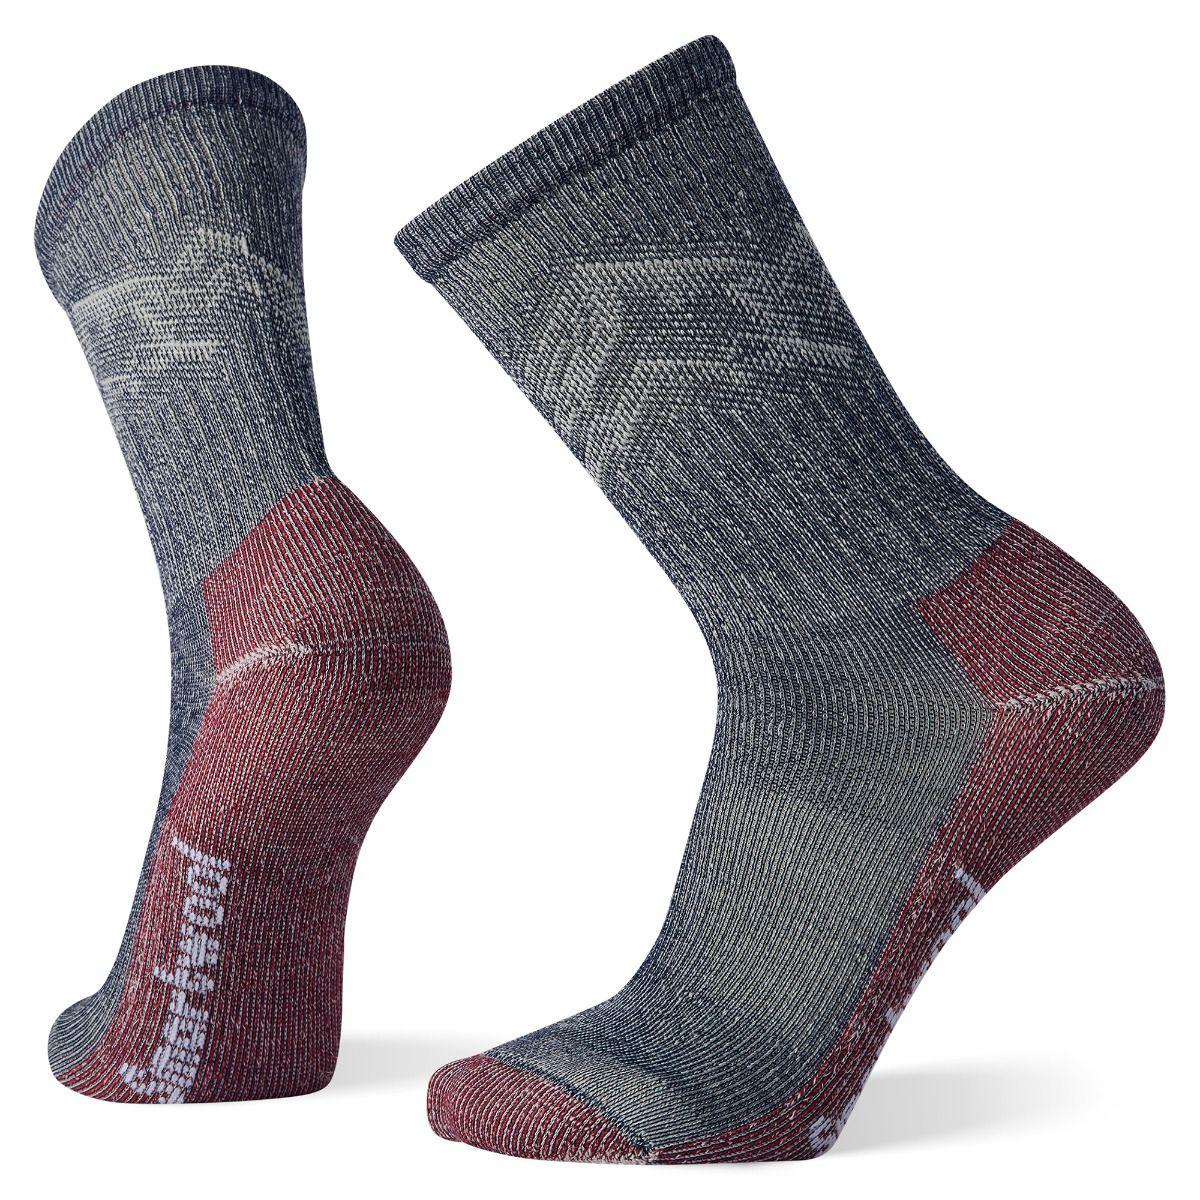 Men's Hike Classic Edition Light Cushion Mountain Pattern Crew Socks